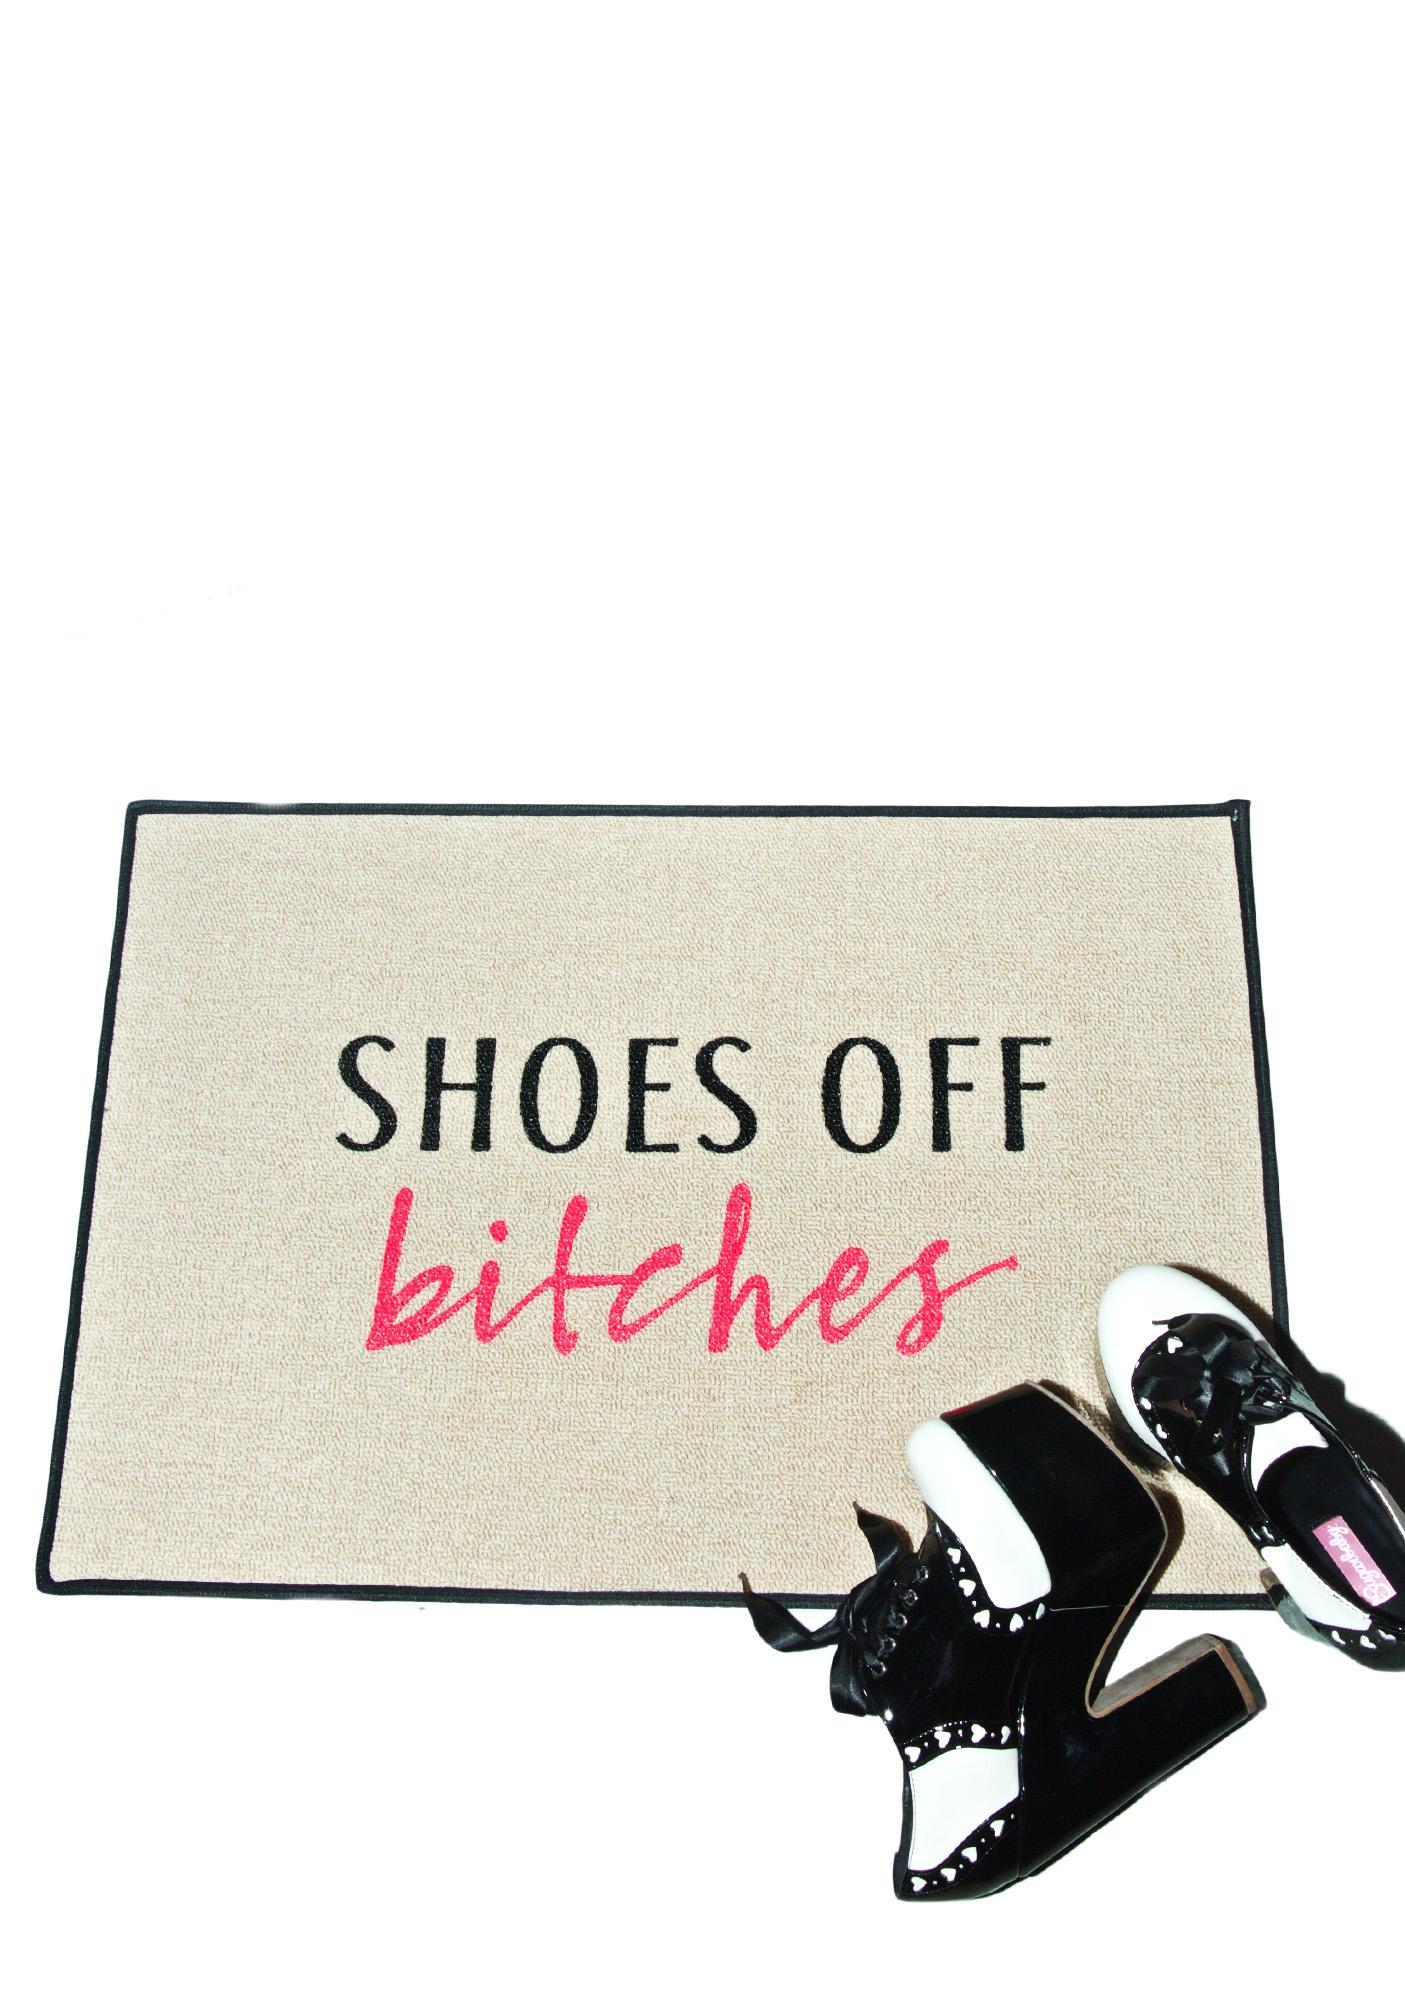 Shoes Off Doormat Uk Style Guru Fashion Glitz Glamour